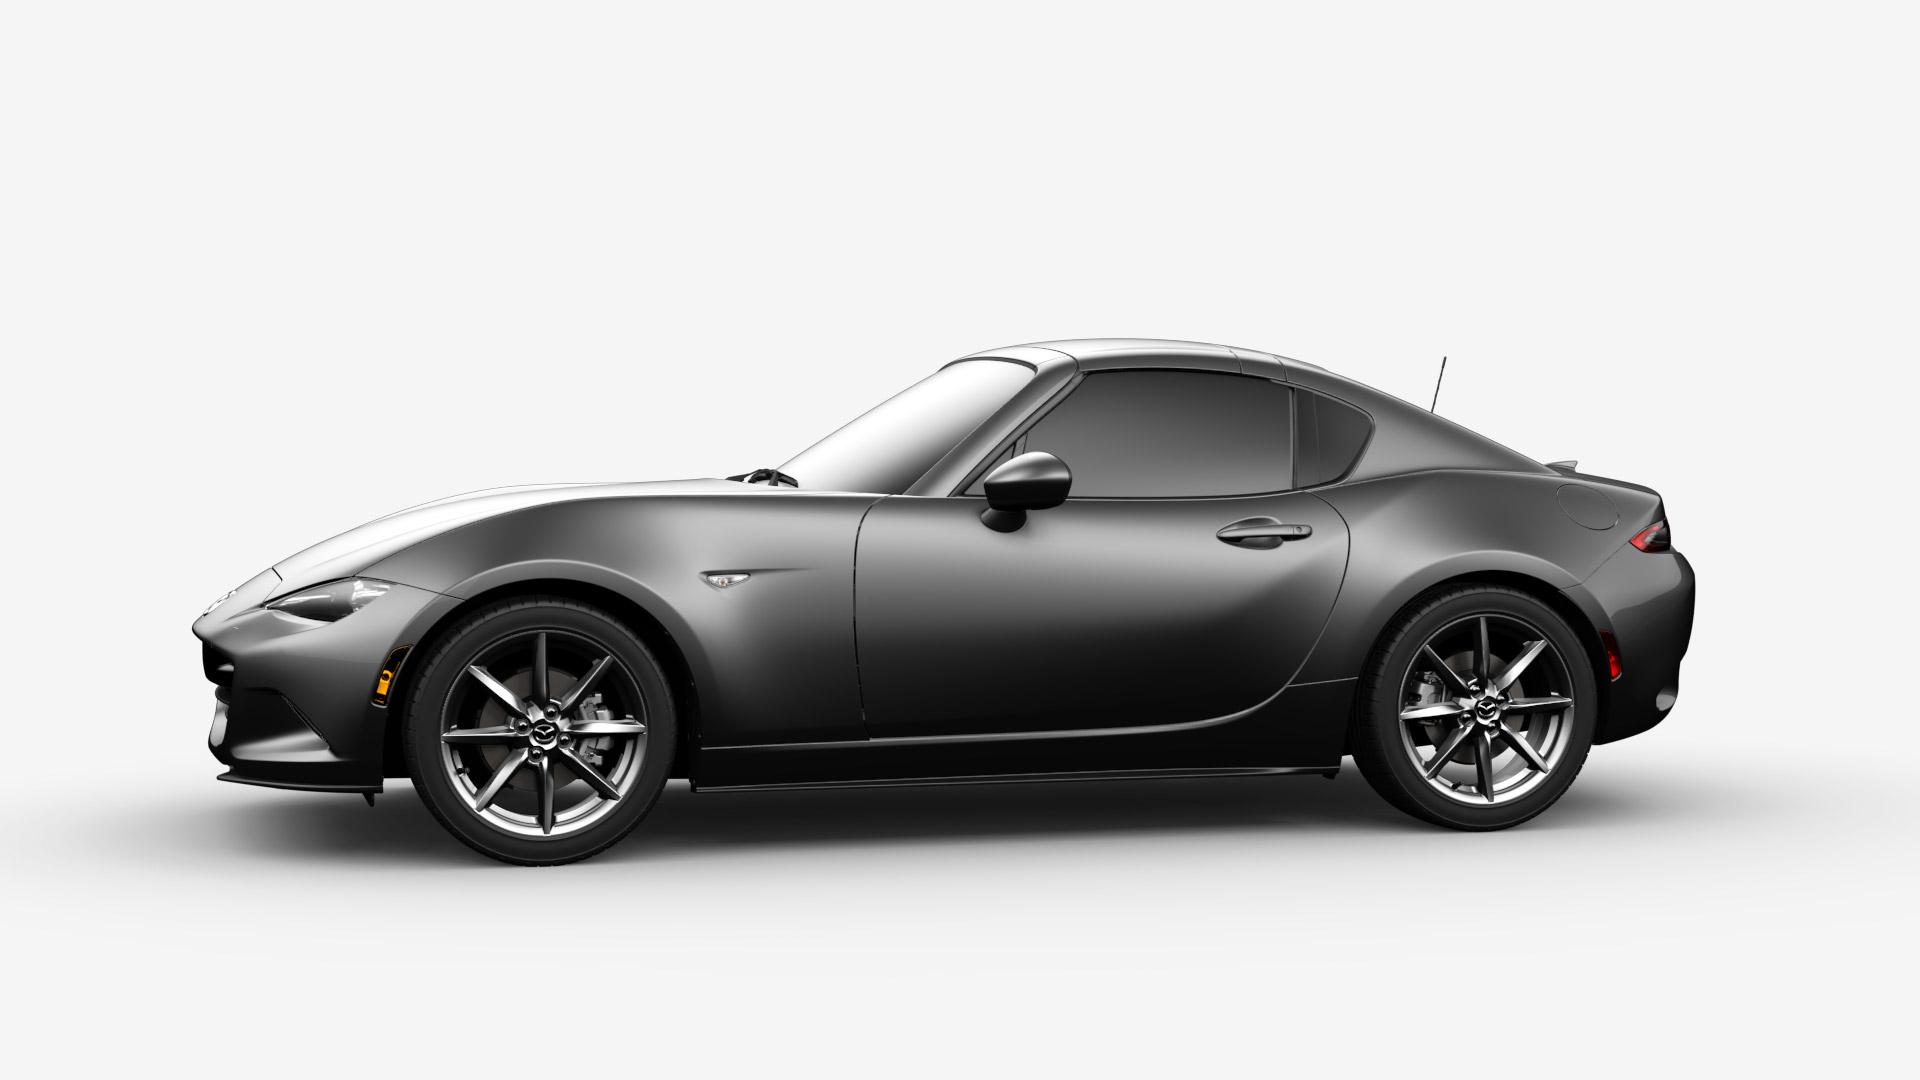 Mazda Mx 5 Rf Cena >> 2017 Mazda Mx 5 Miata Rf Hard Top Convertible Mazda Usa